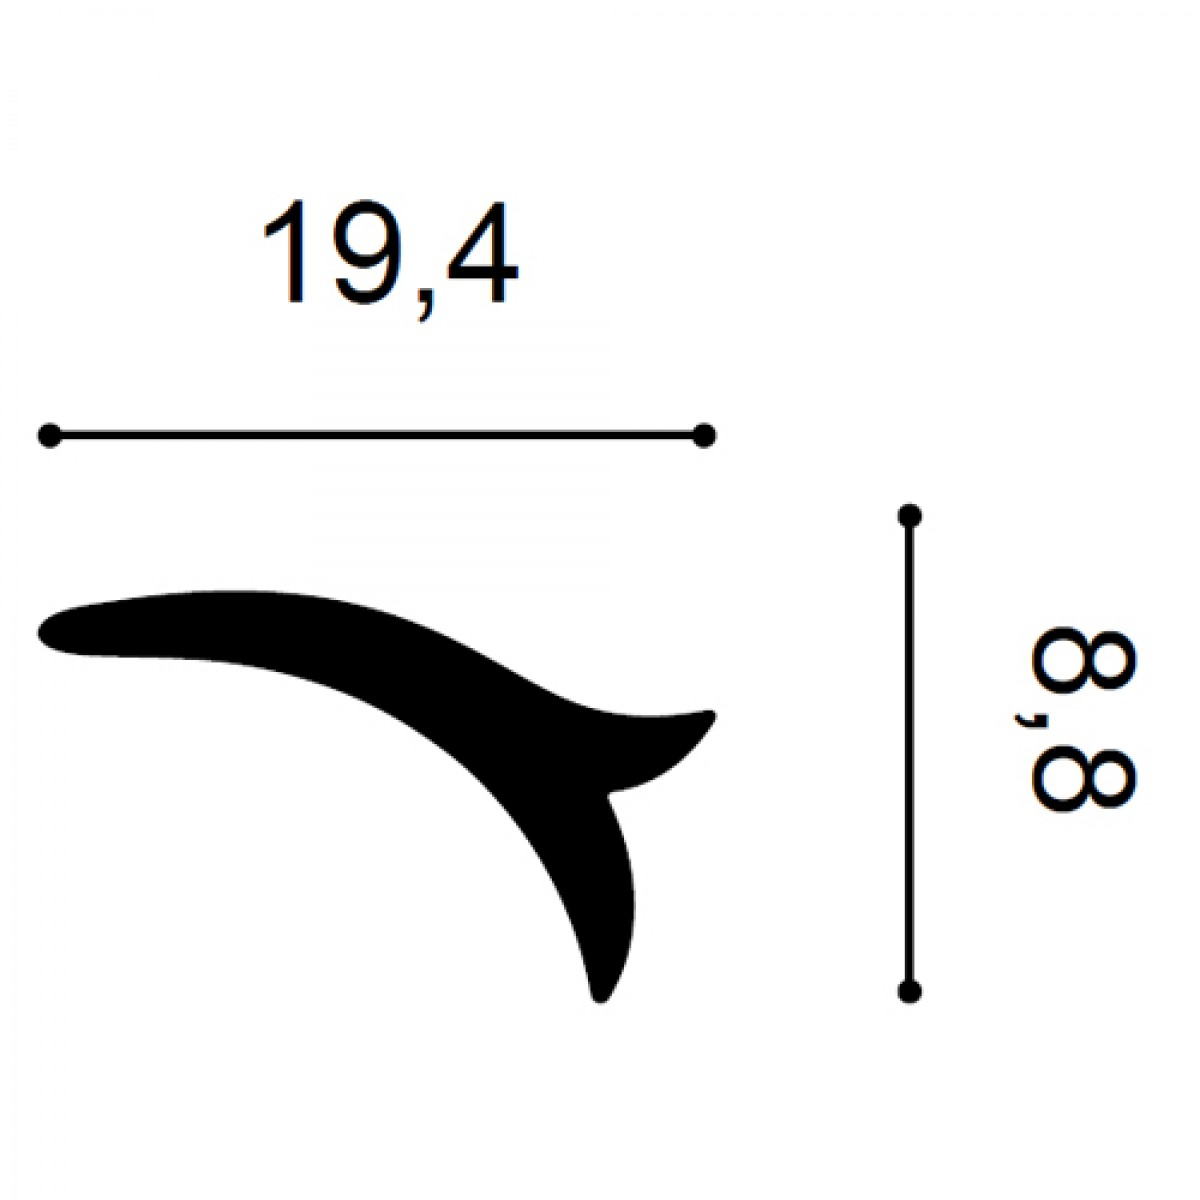 Element Decorativ Ulf Moritz G77, Dimensiuni: 19.2 X 9 X 1.8 cm, Orac Decor